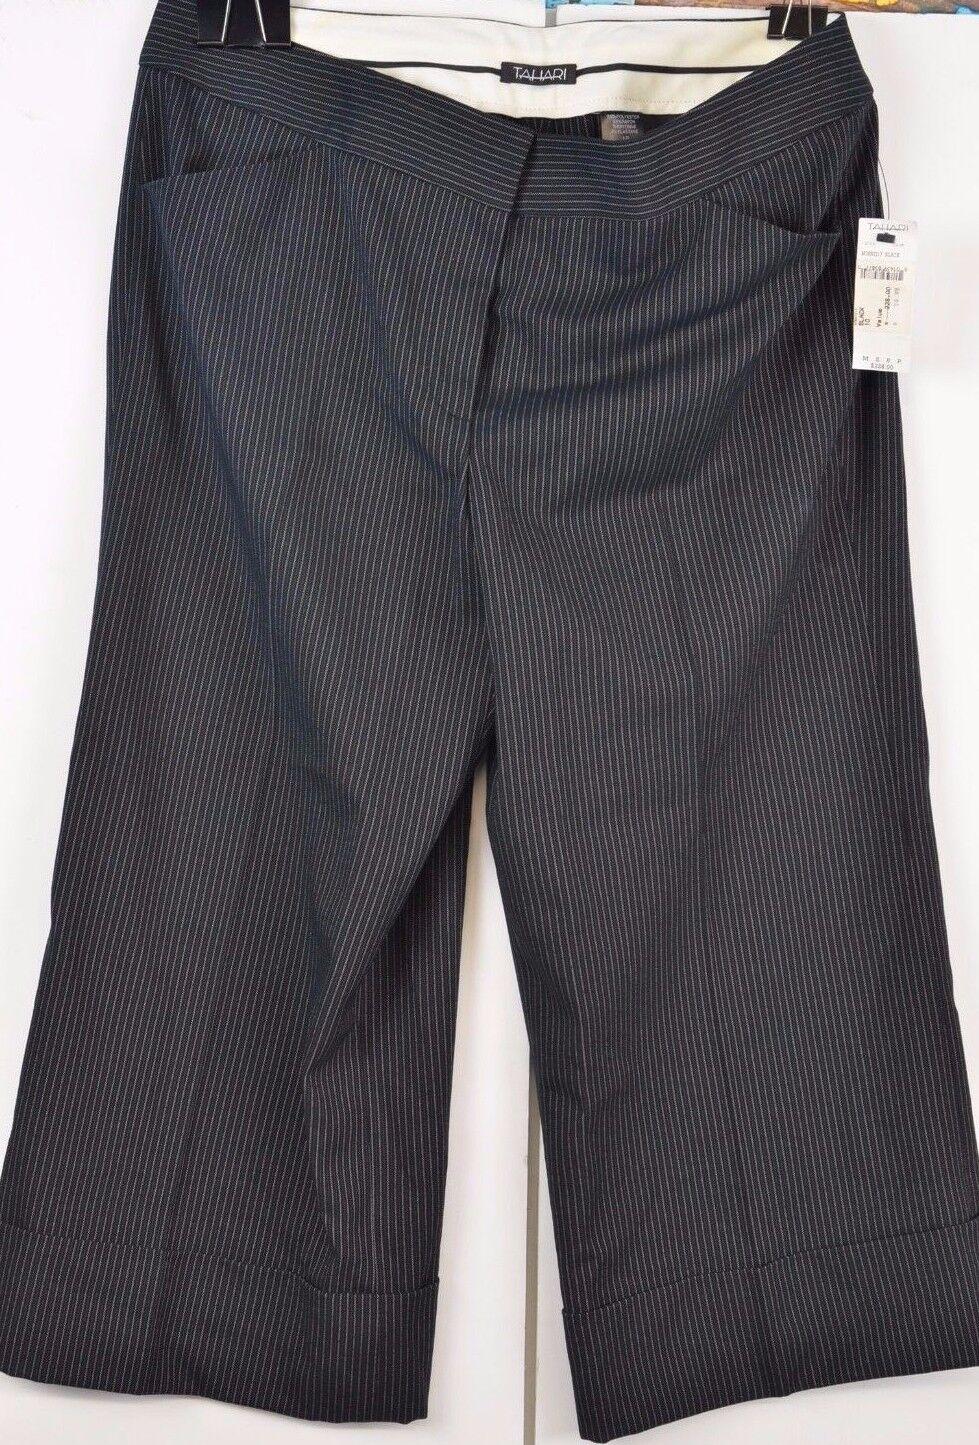 Tahari Cropped Capri Pants Pin Striped Size 10 New Retail  228 Flat Front Career